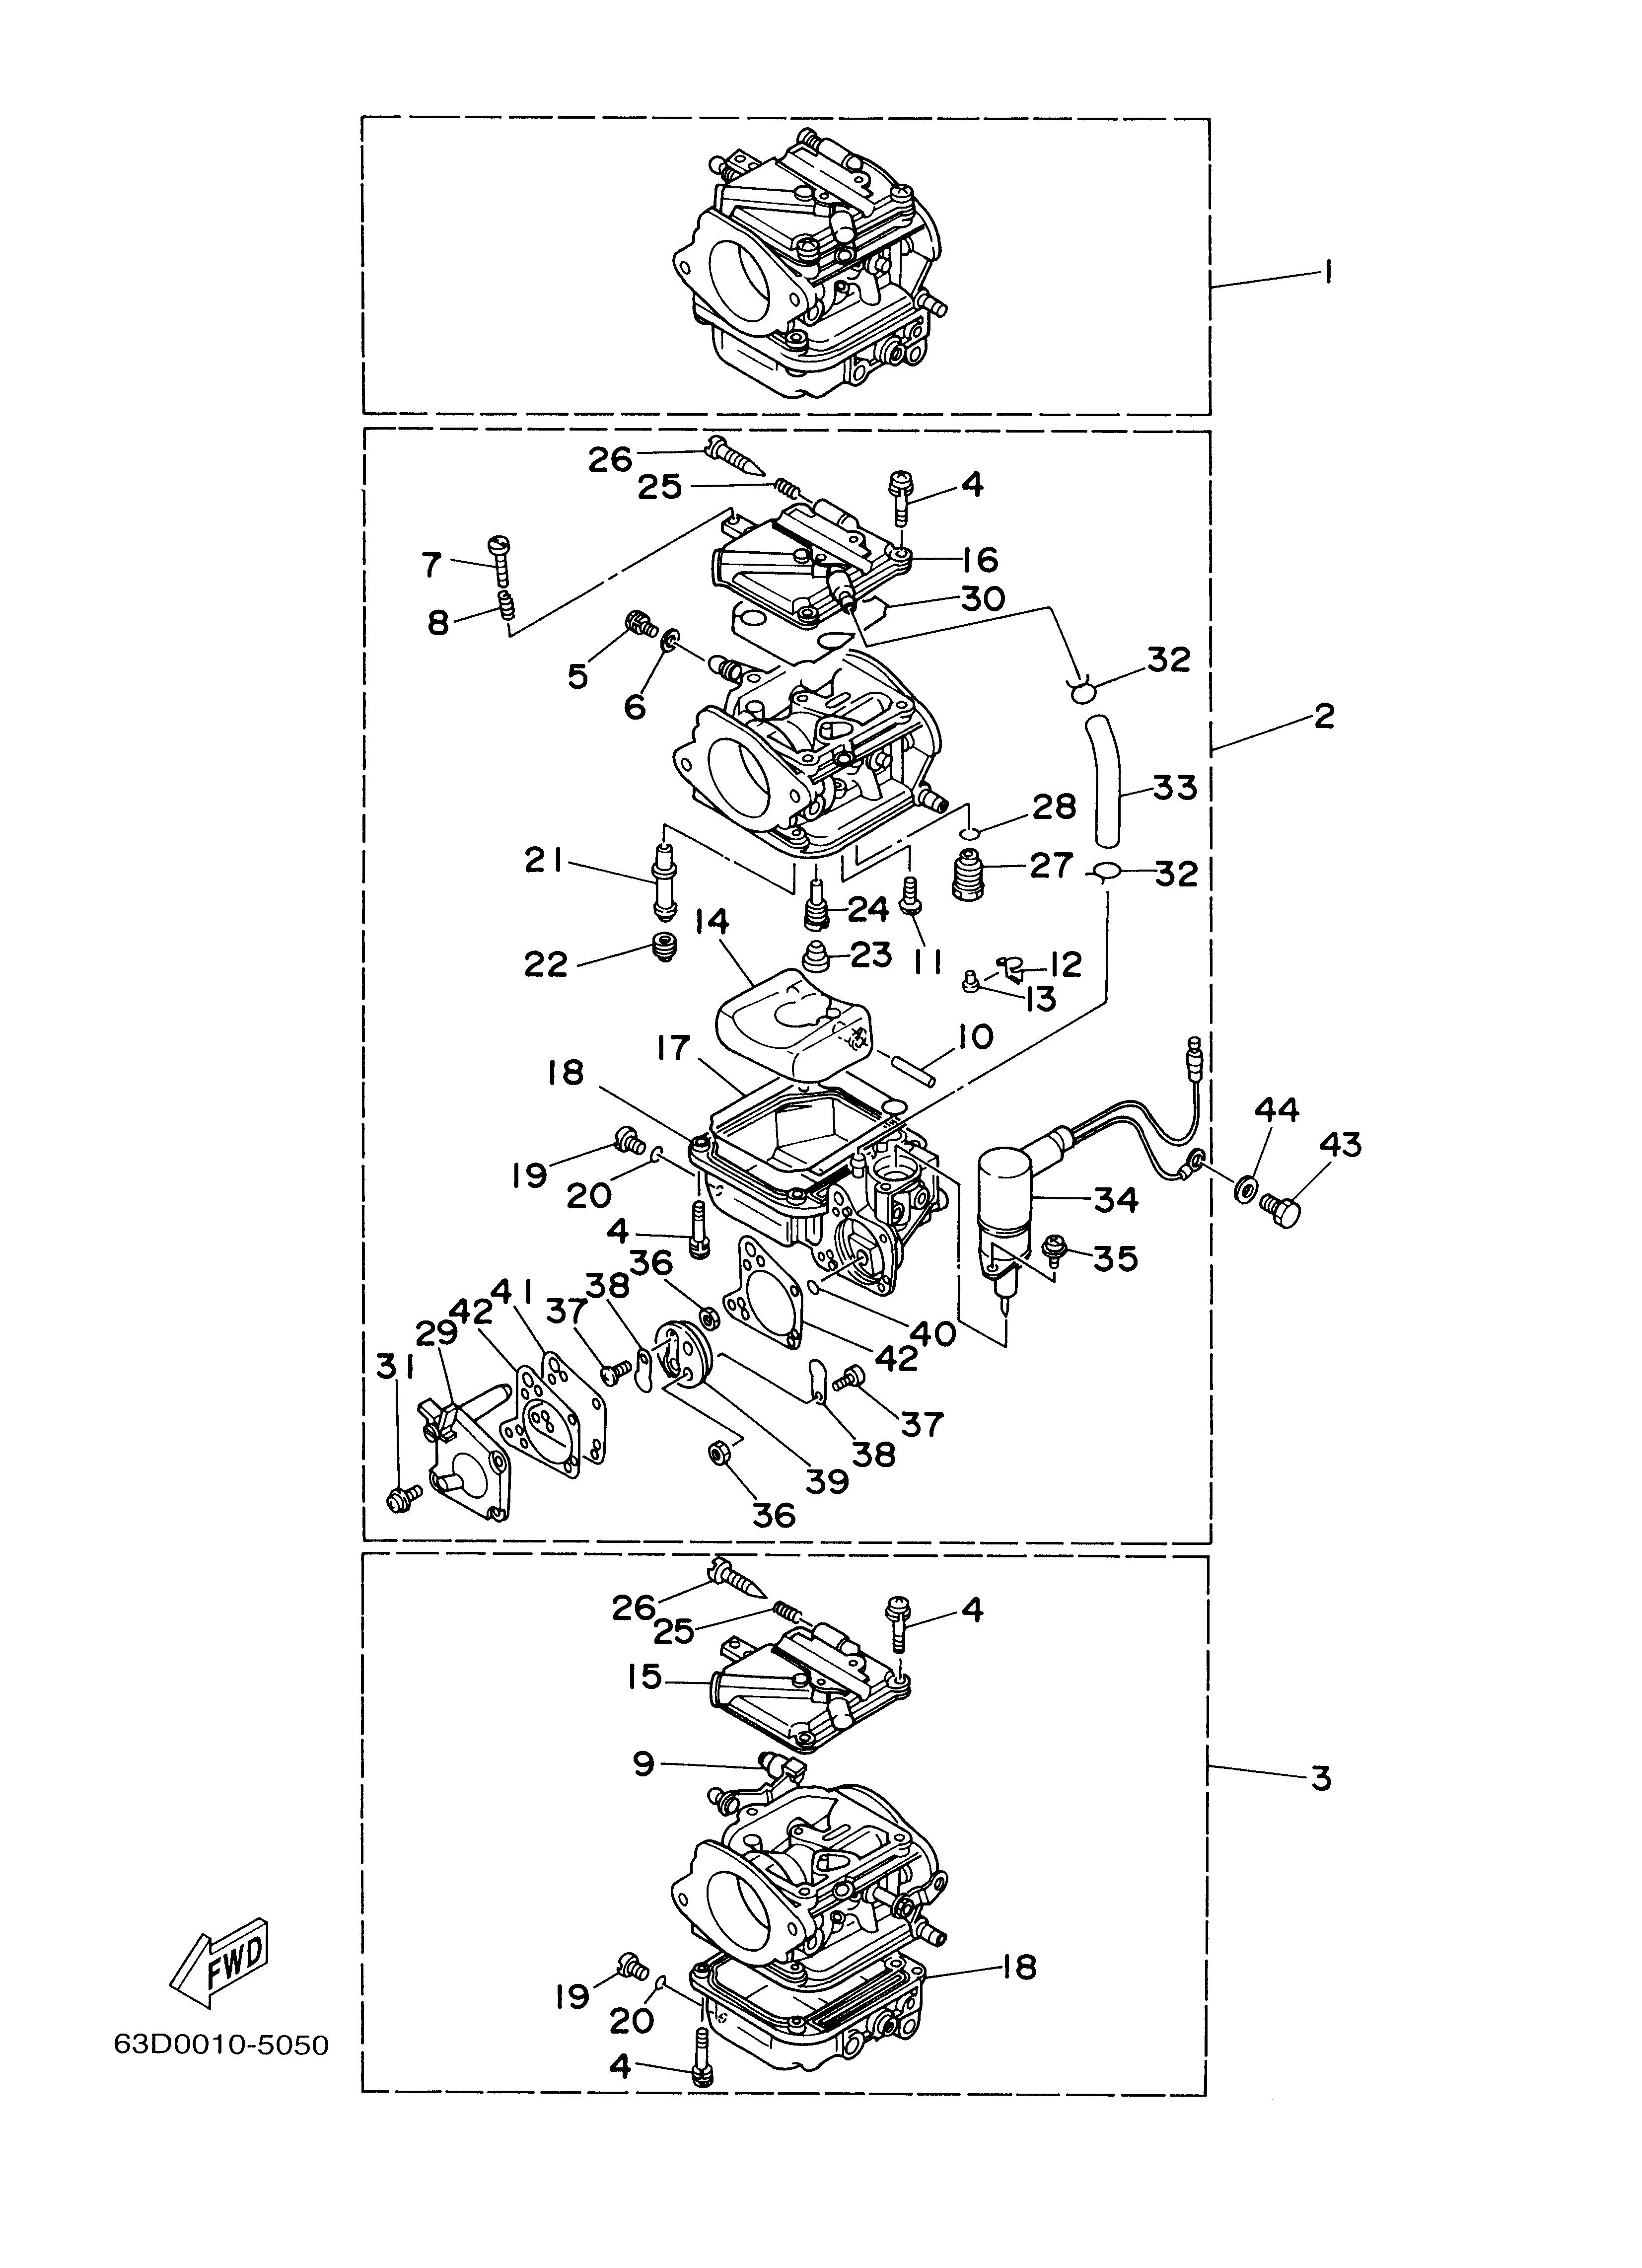 Yamaha 2 Stroke Diagram - Wiring Diagrams